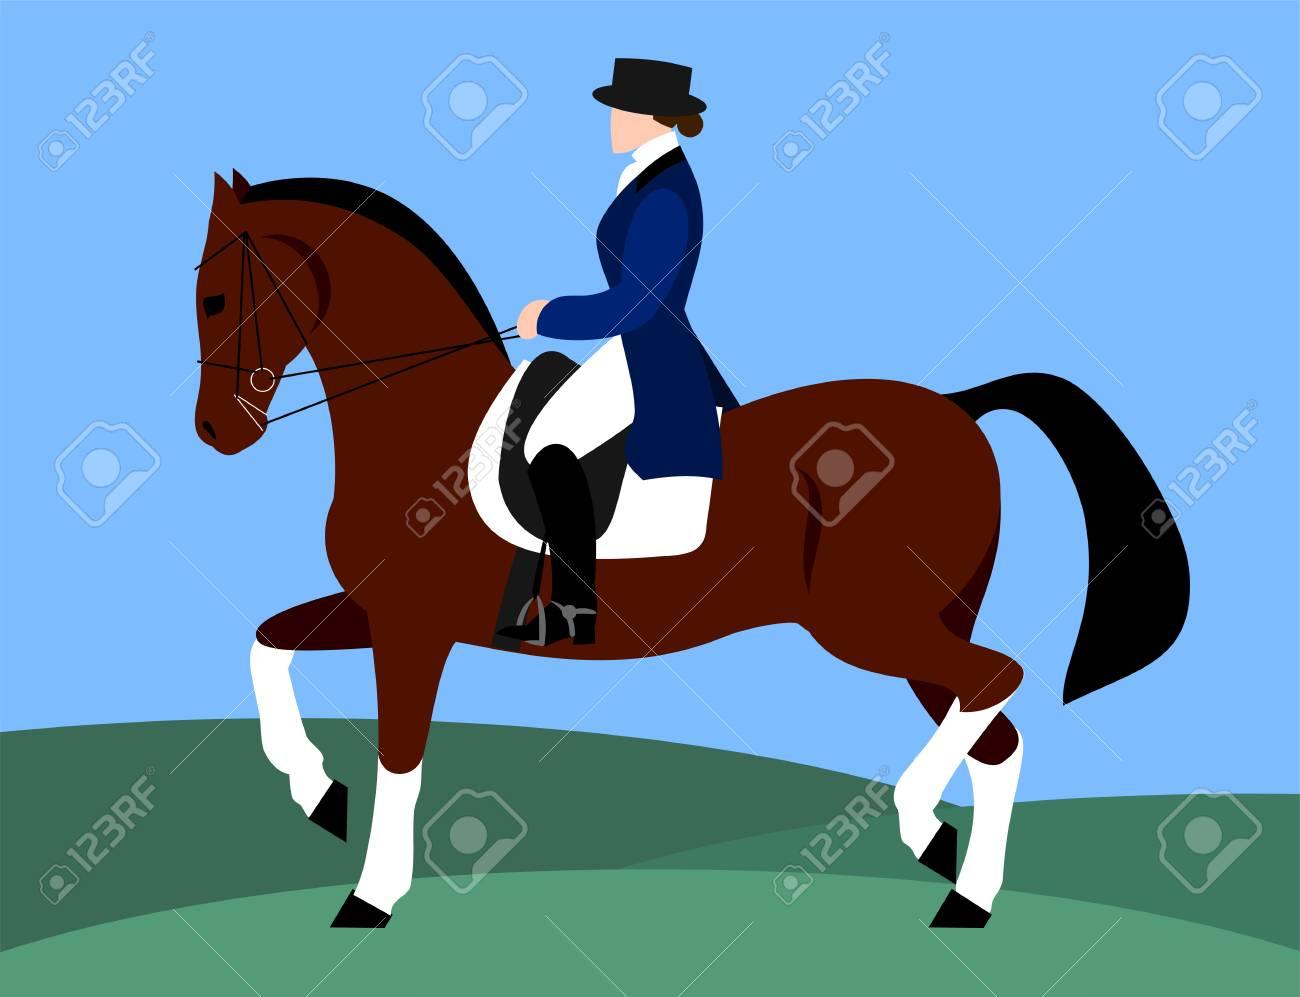 Horsewoman on horseback (rider), flat design - 122683806